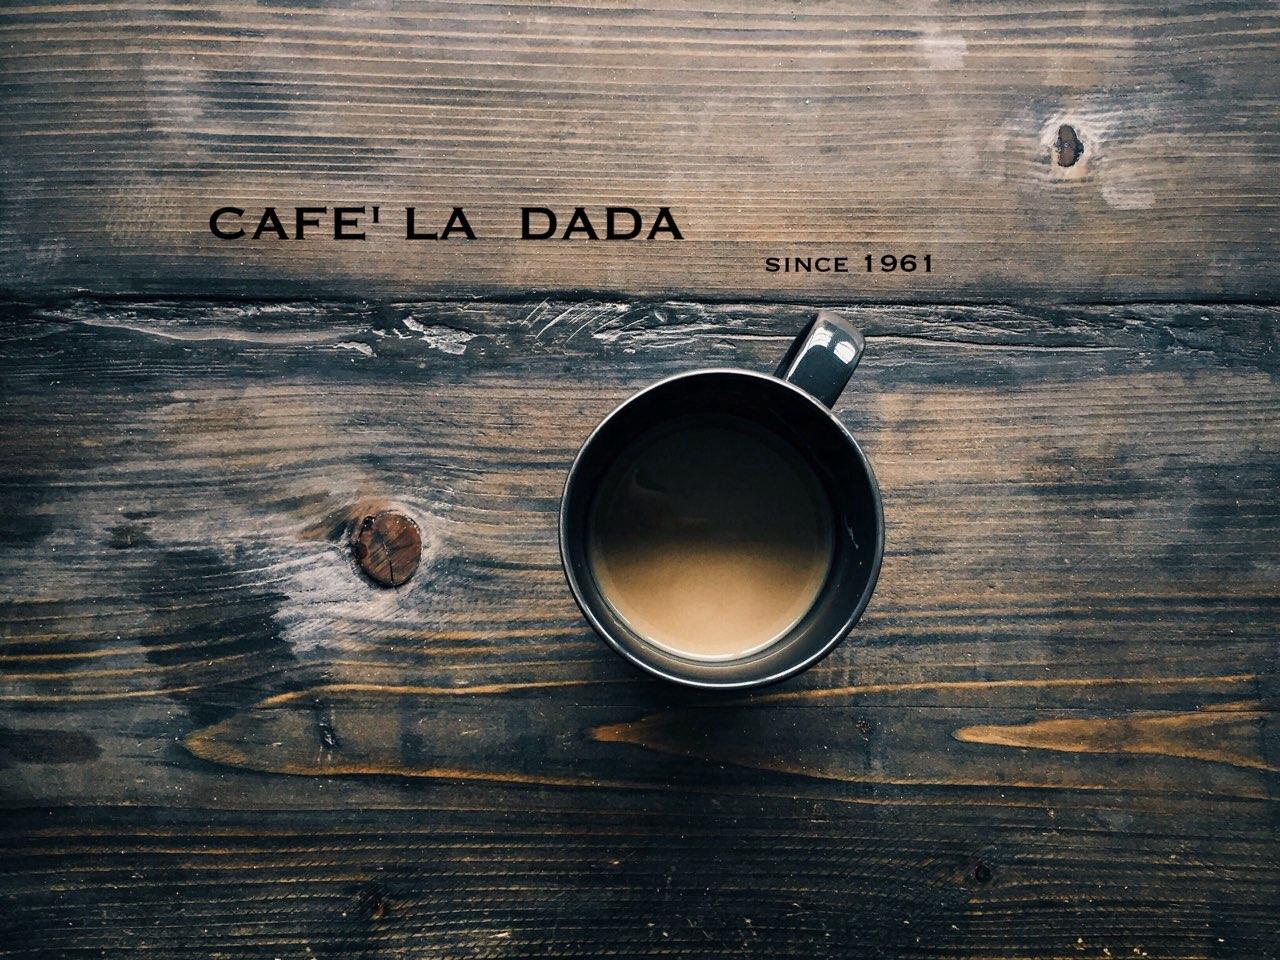 cafe la dada